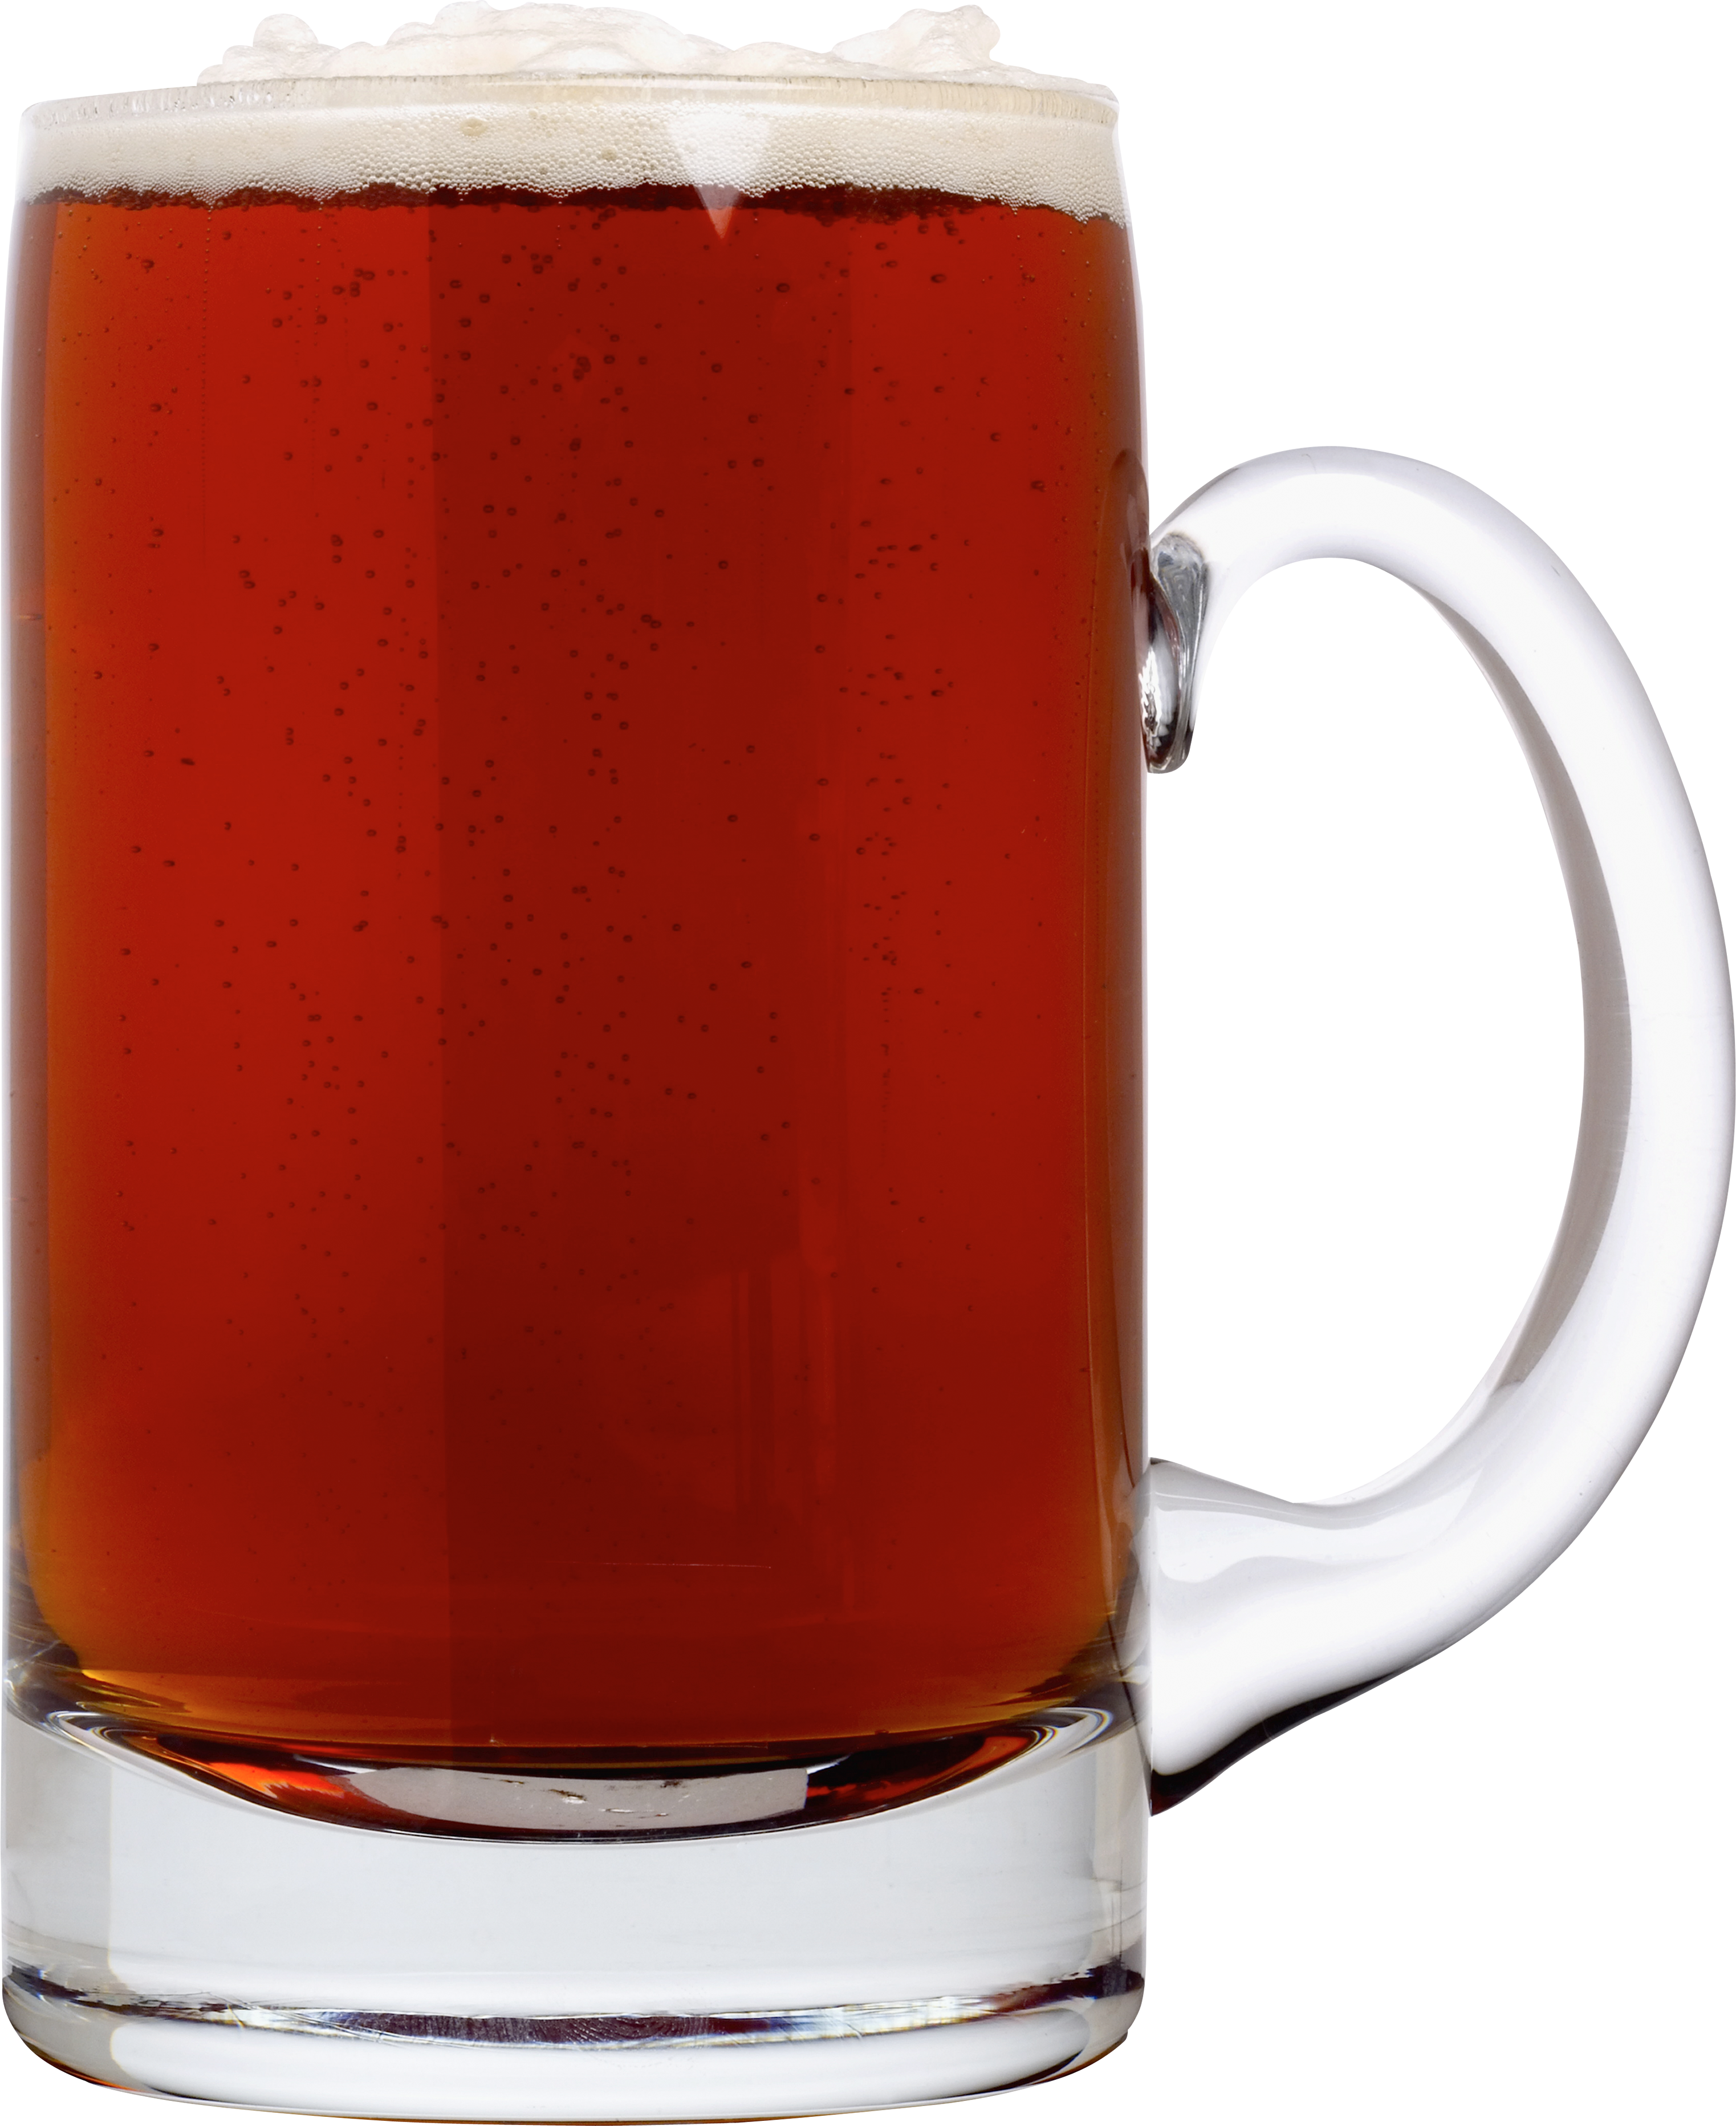 Dark Beer in Glass PNG Image